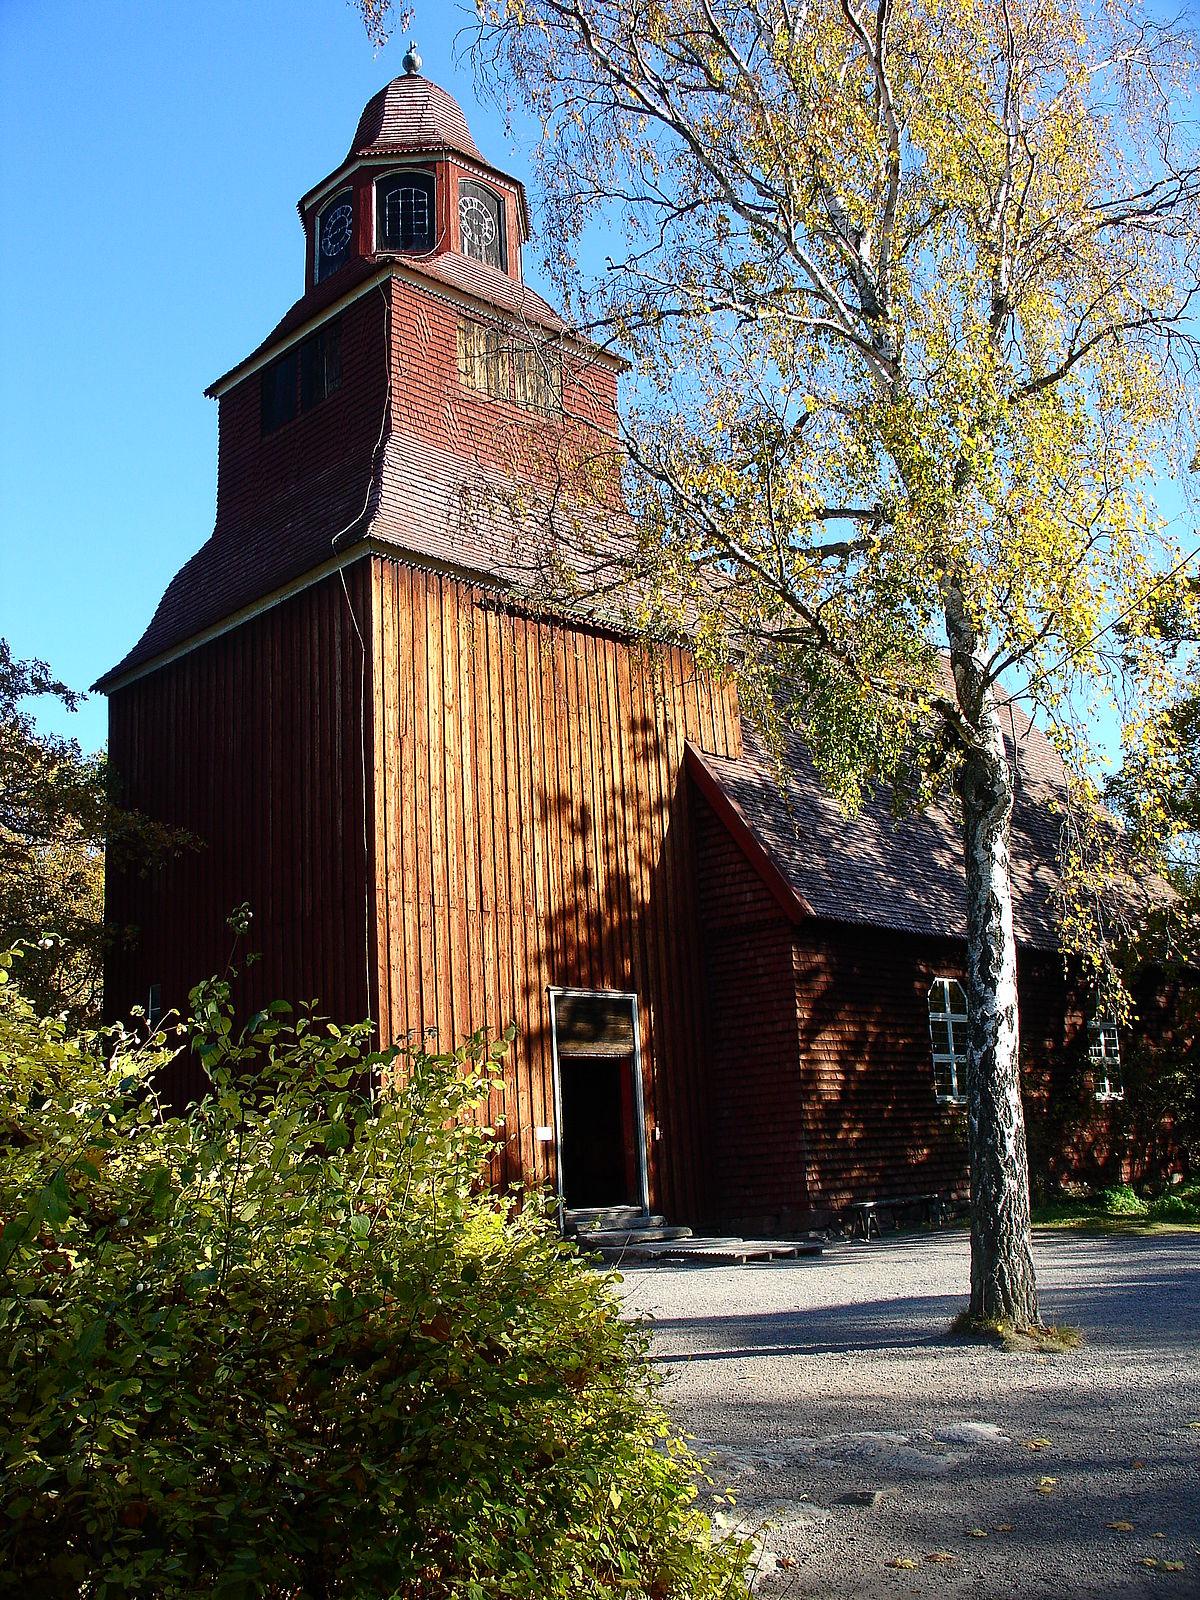 Seglora church, Seglora kyrka, Skansen (Stockholm - Alamy